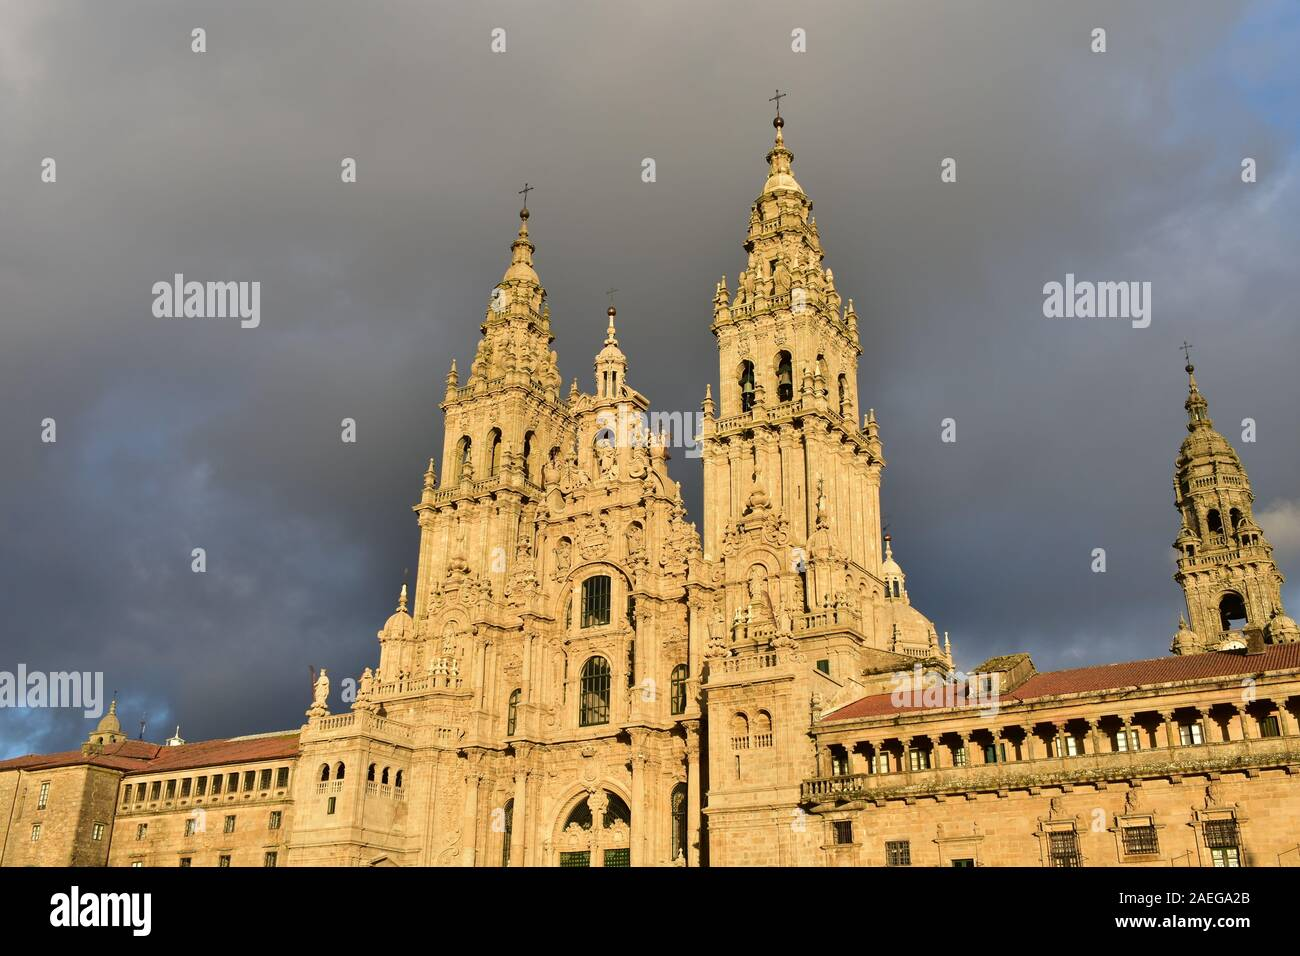 Cathedral with sunset light on a rainy day. View from Praza do Obradoiro. Santiago de Compostela, Spain. Stock Photo